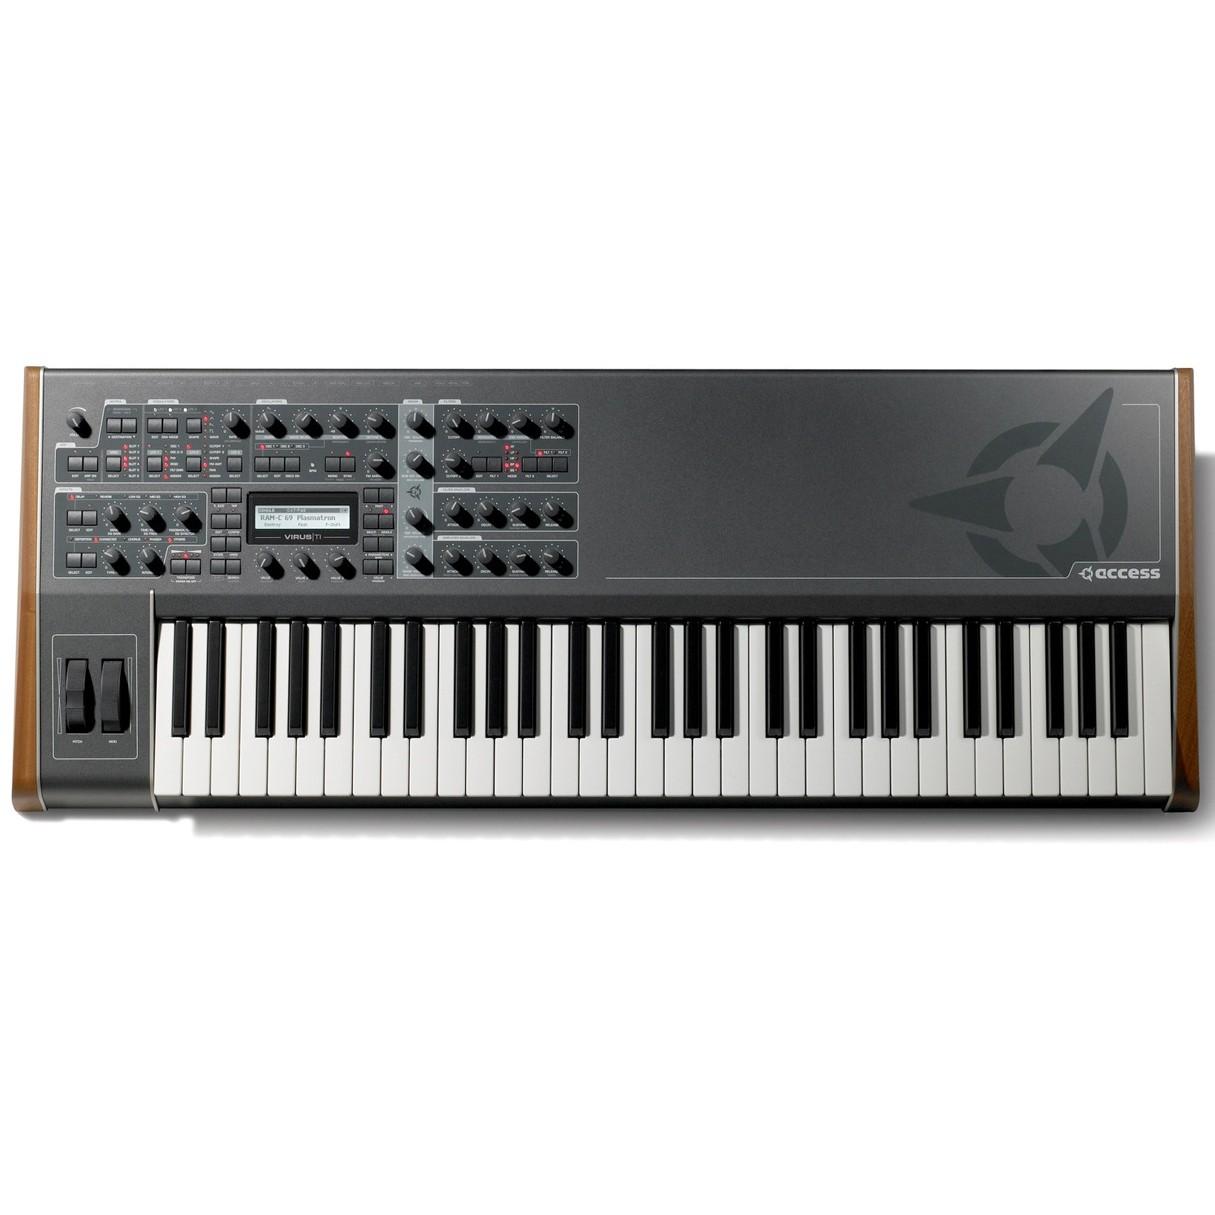 access virus ti2 keyboard. Black Bedroom Furniture Sets. Home Design Ideas